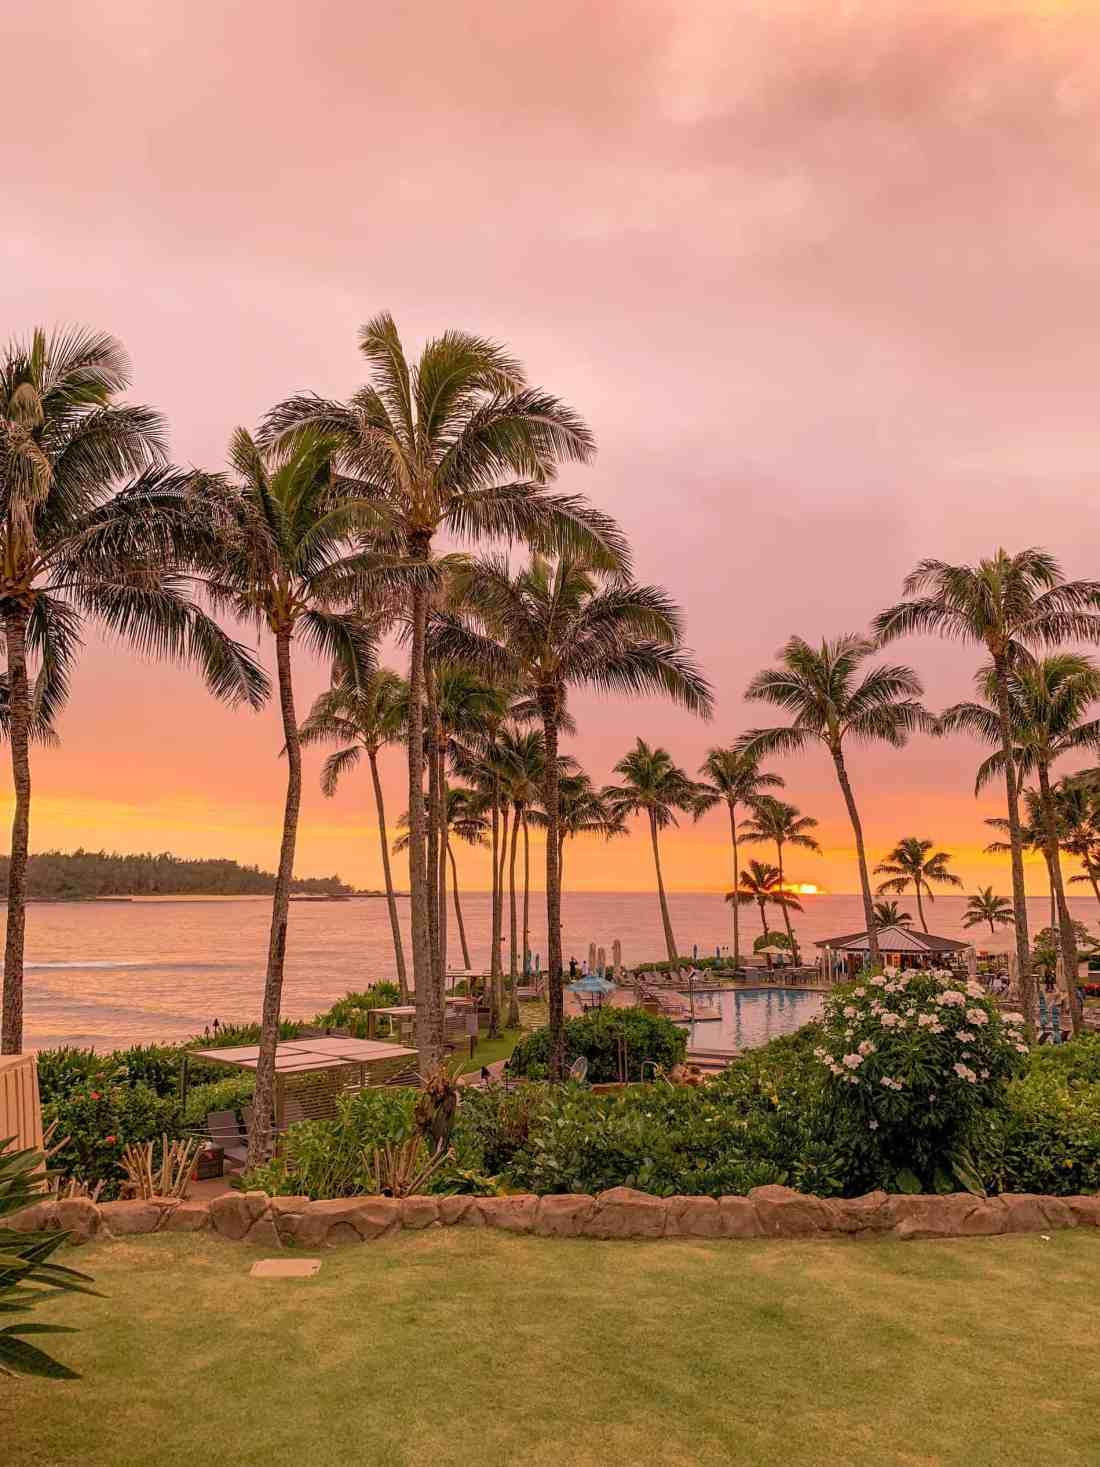 sunset at turtle bay resort in oahu hawaii